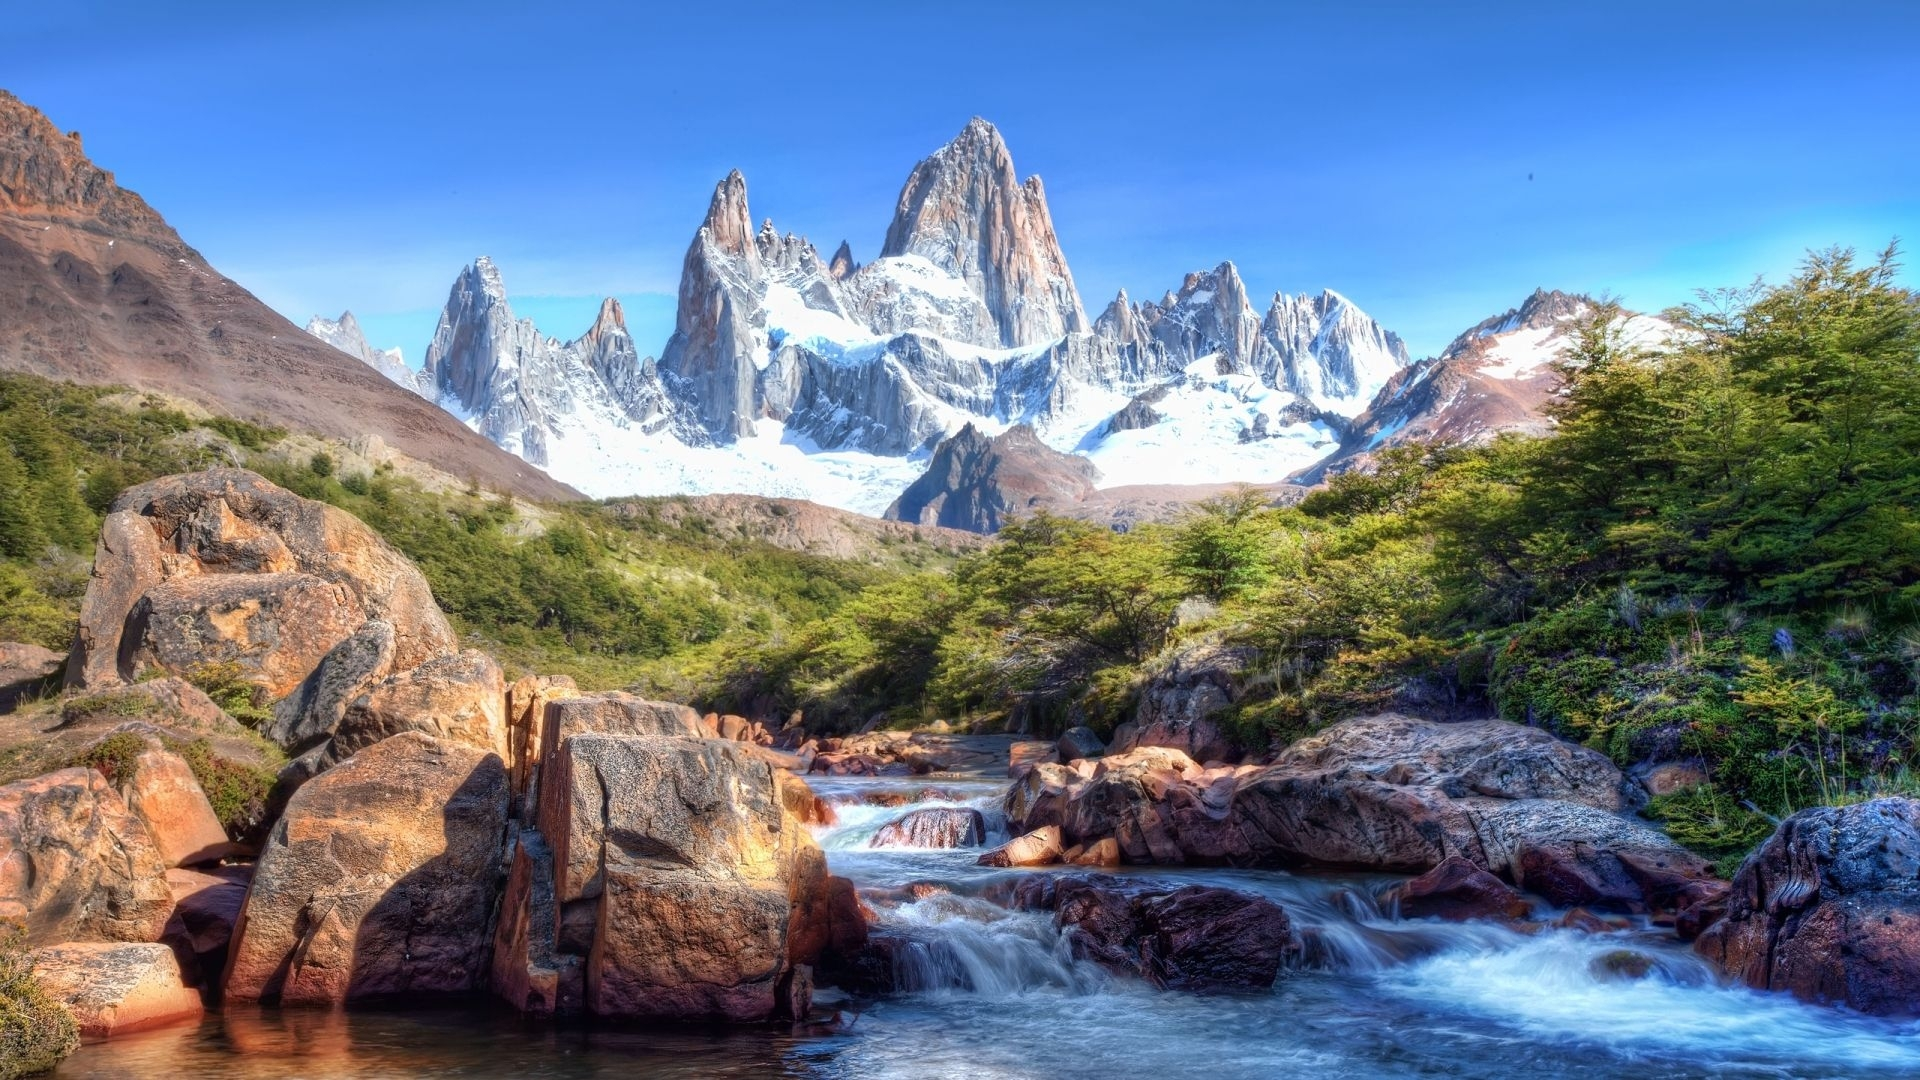 1080p hd wallpapers landscape |  landscape > mountains and river